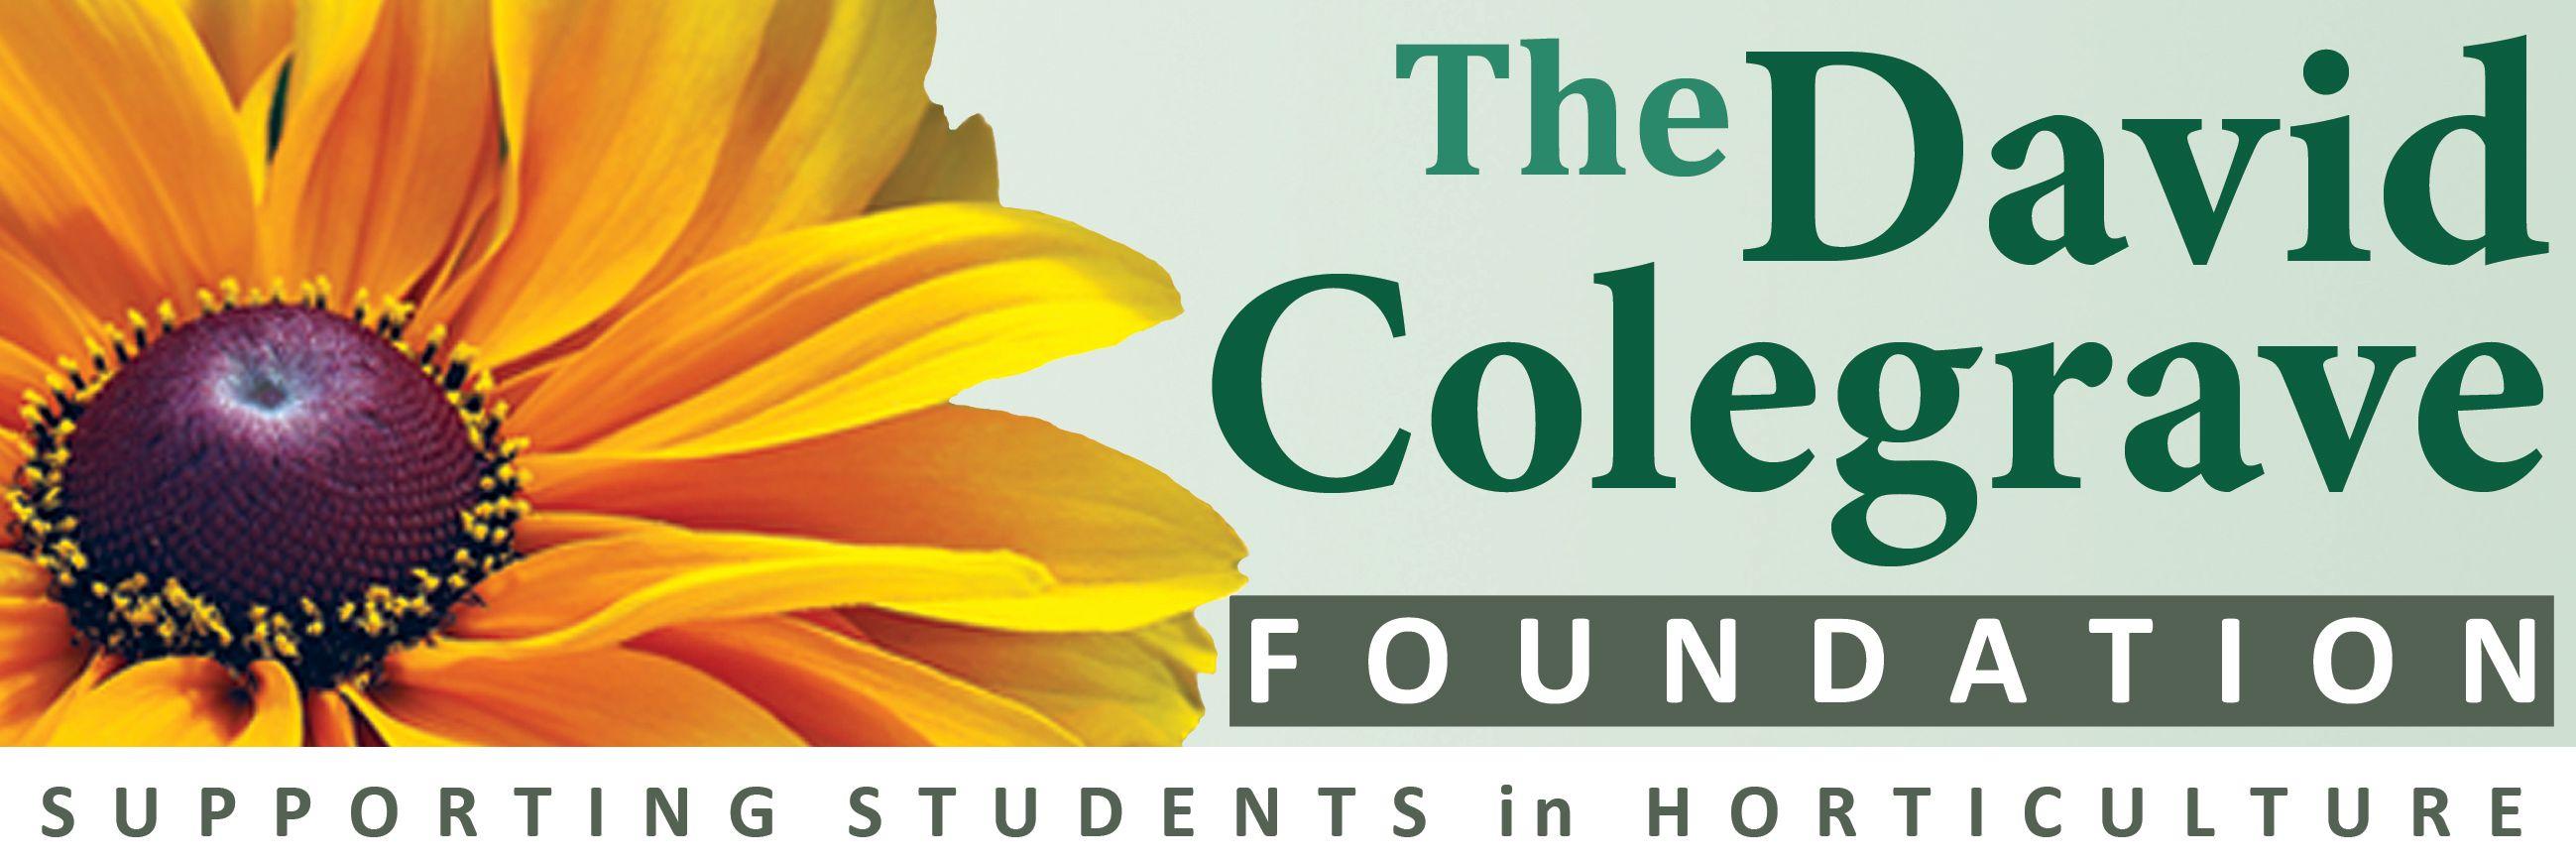 David Colegrave Foundation - NB91